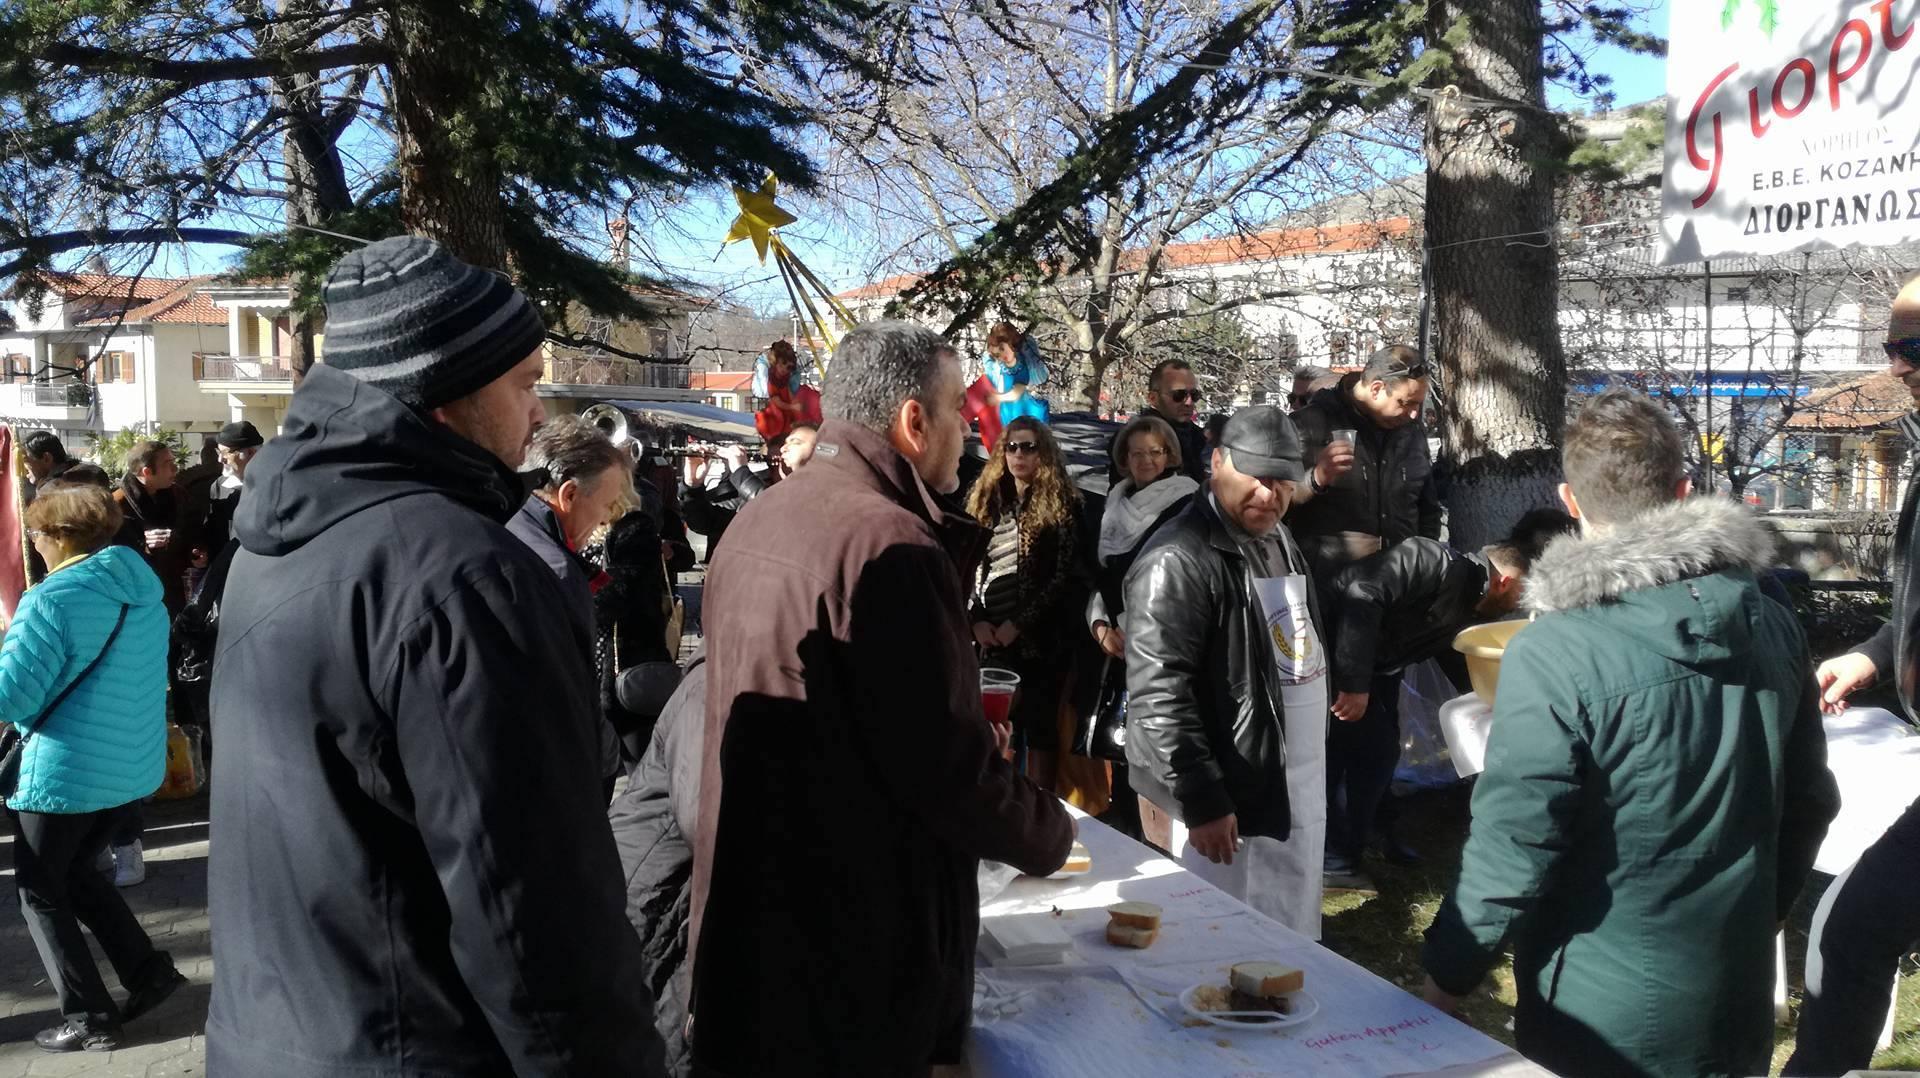 kozan.gr: Γλέντι και μοναδικοί μεζέδες στη Γιορτή Τσιγαρίδας στην Εράτυρα του δήμου Βοΐου (Φωτογραφίες & Bίντεο)